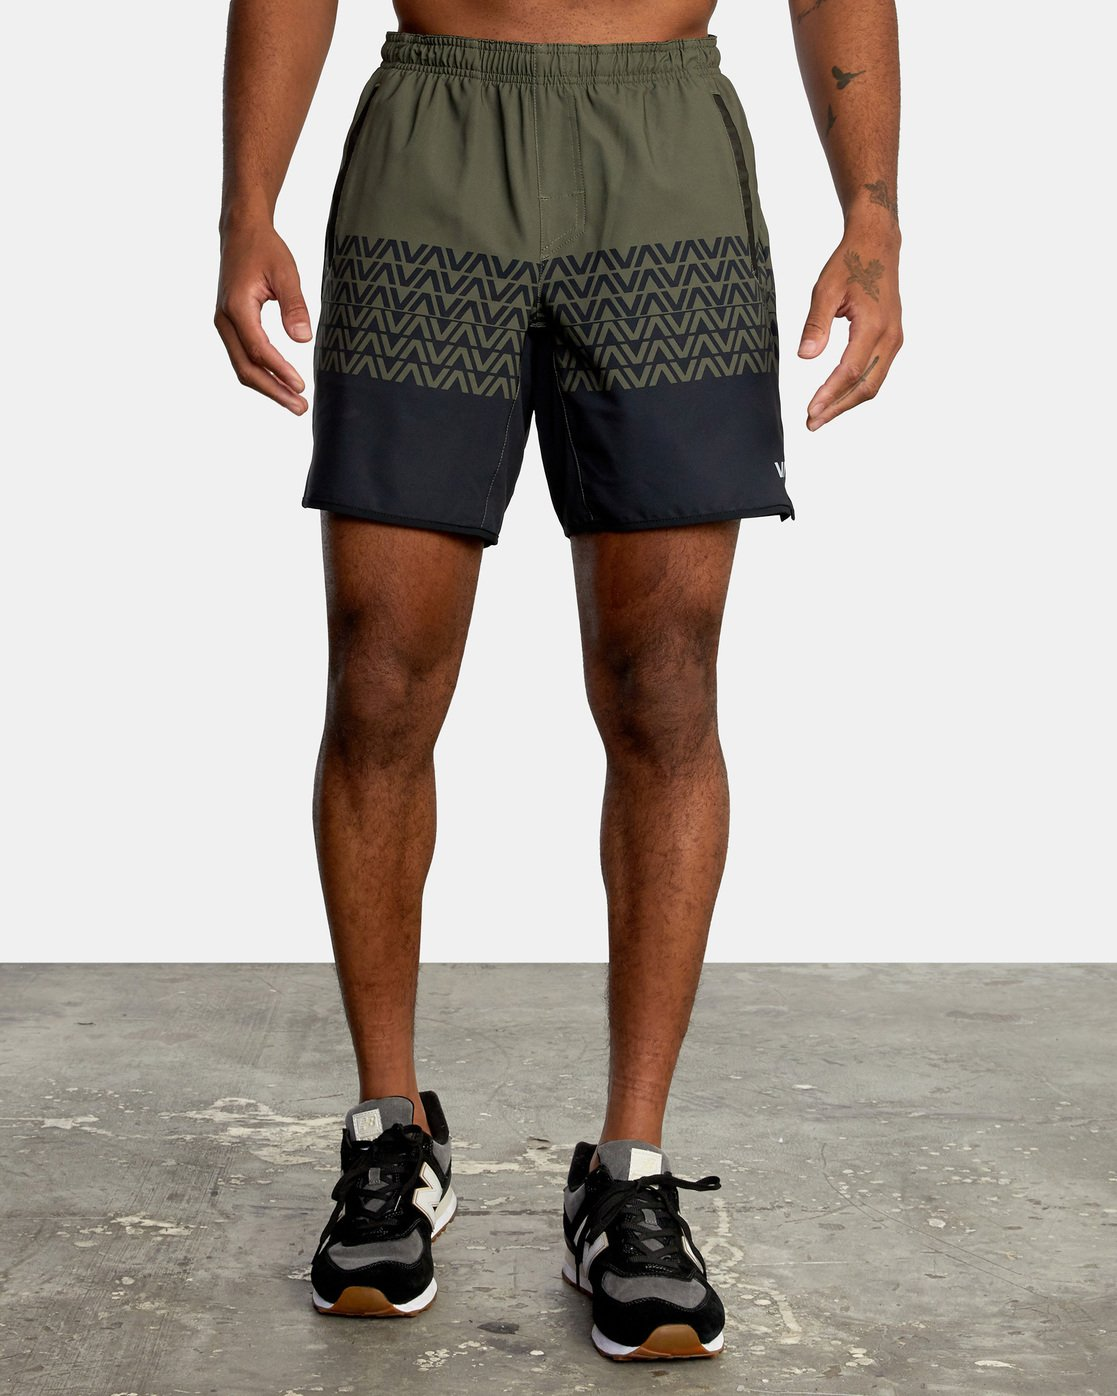 0 VA Sport Yogger Stretch - Recycled Performance Training Shorts for Men Green X4WKMBRVS1 RVCA